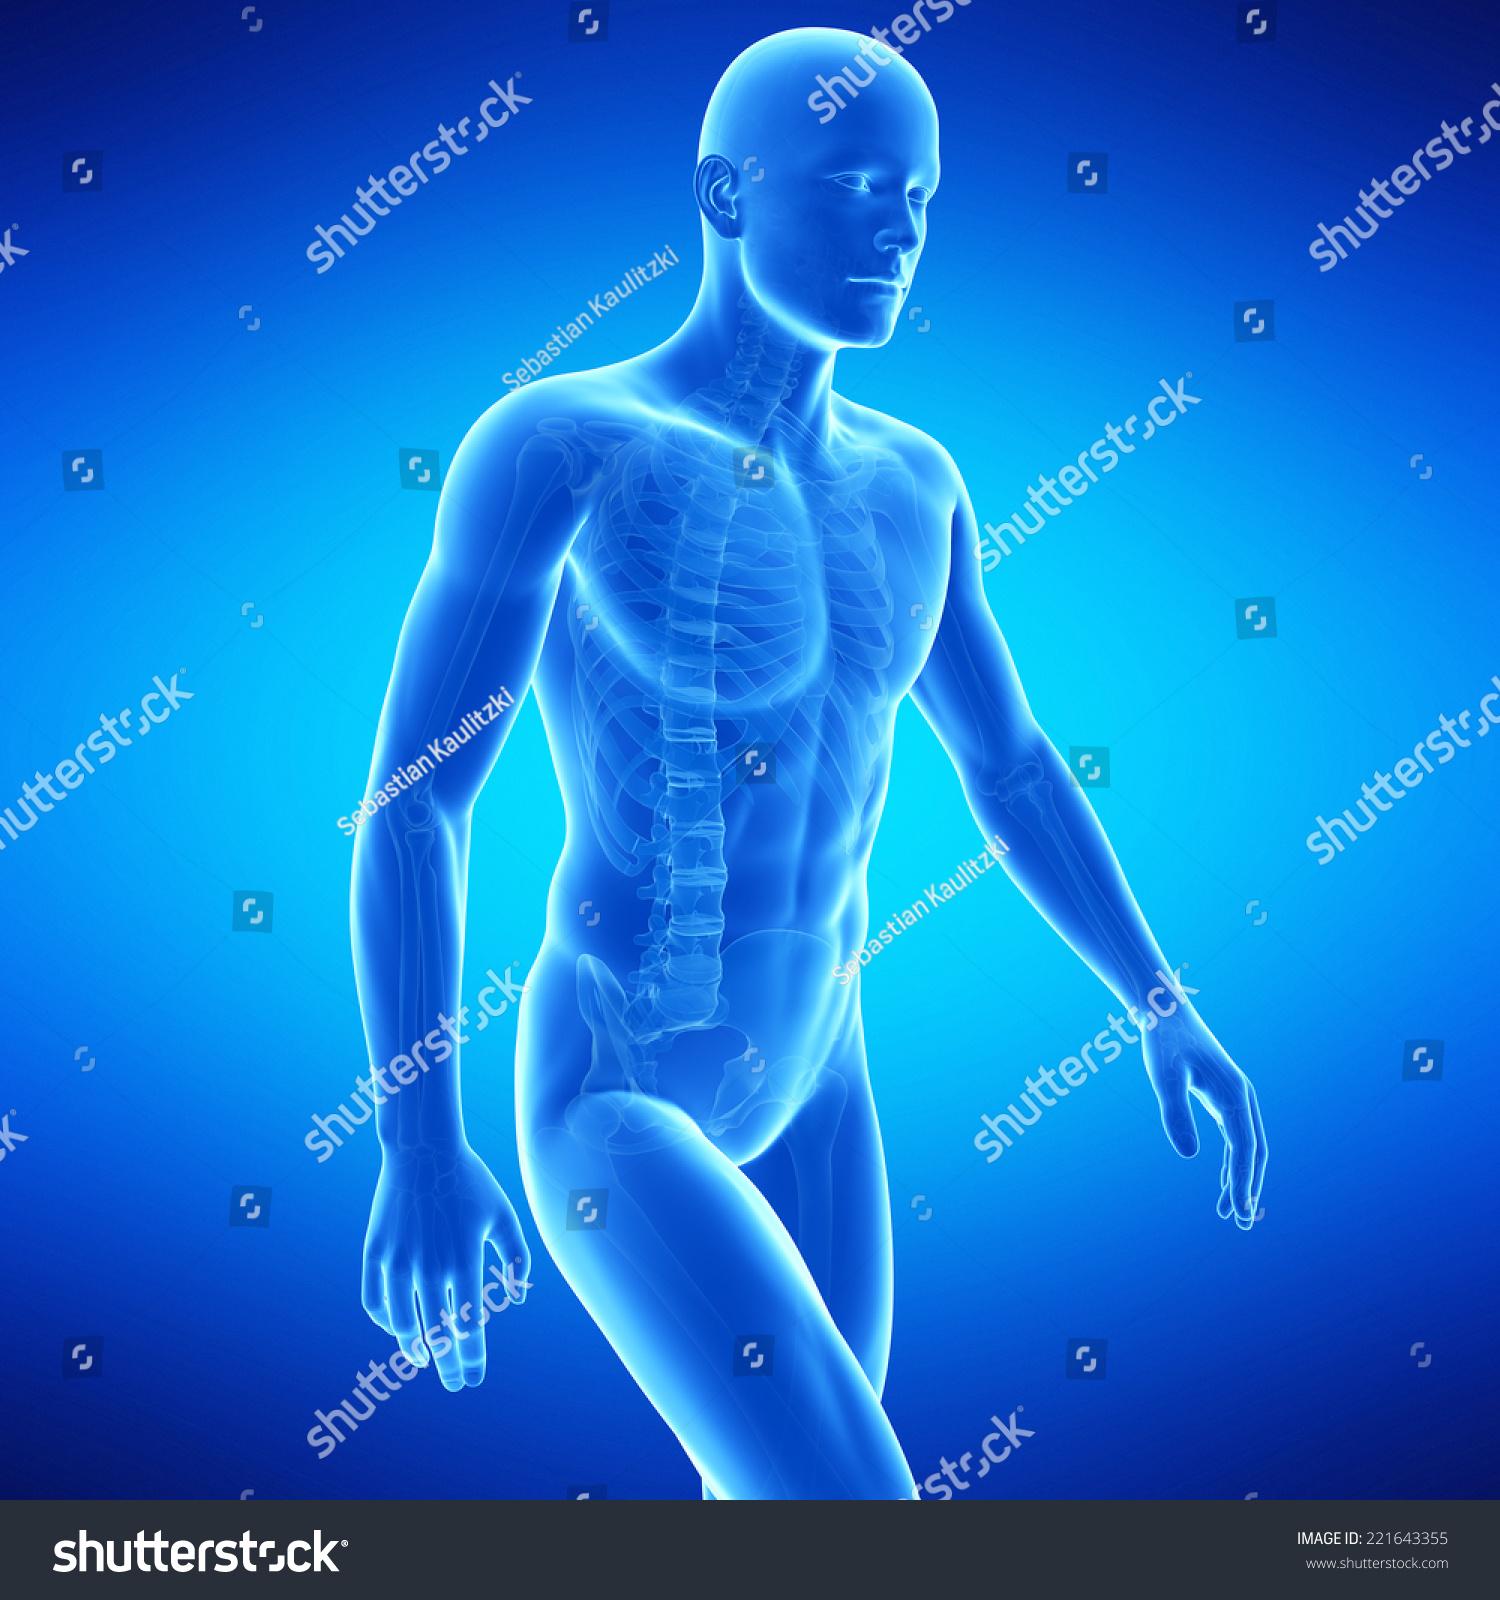 Medical Illustration Of The Upper Body Anatomy Ez Canvas